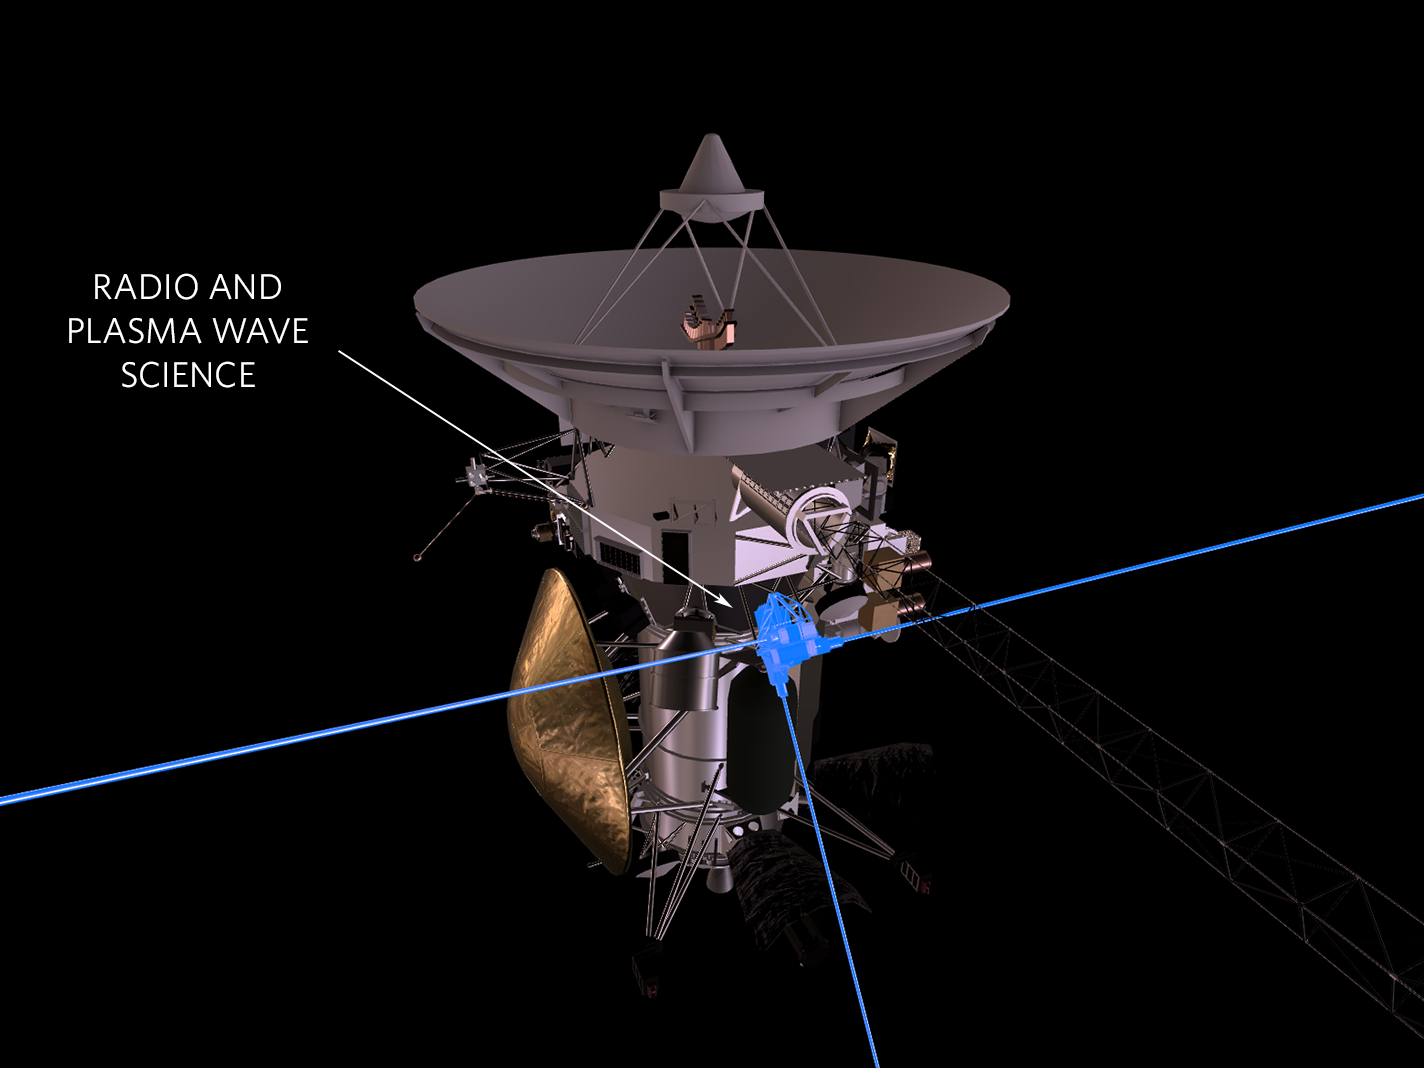 serie nasas cassini spacecraft - HD1424×1068